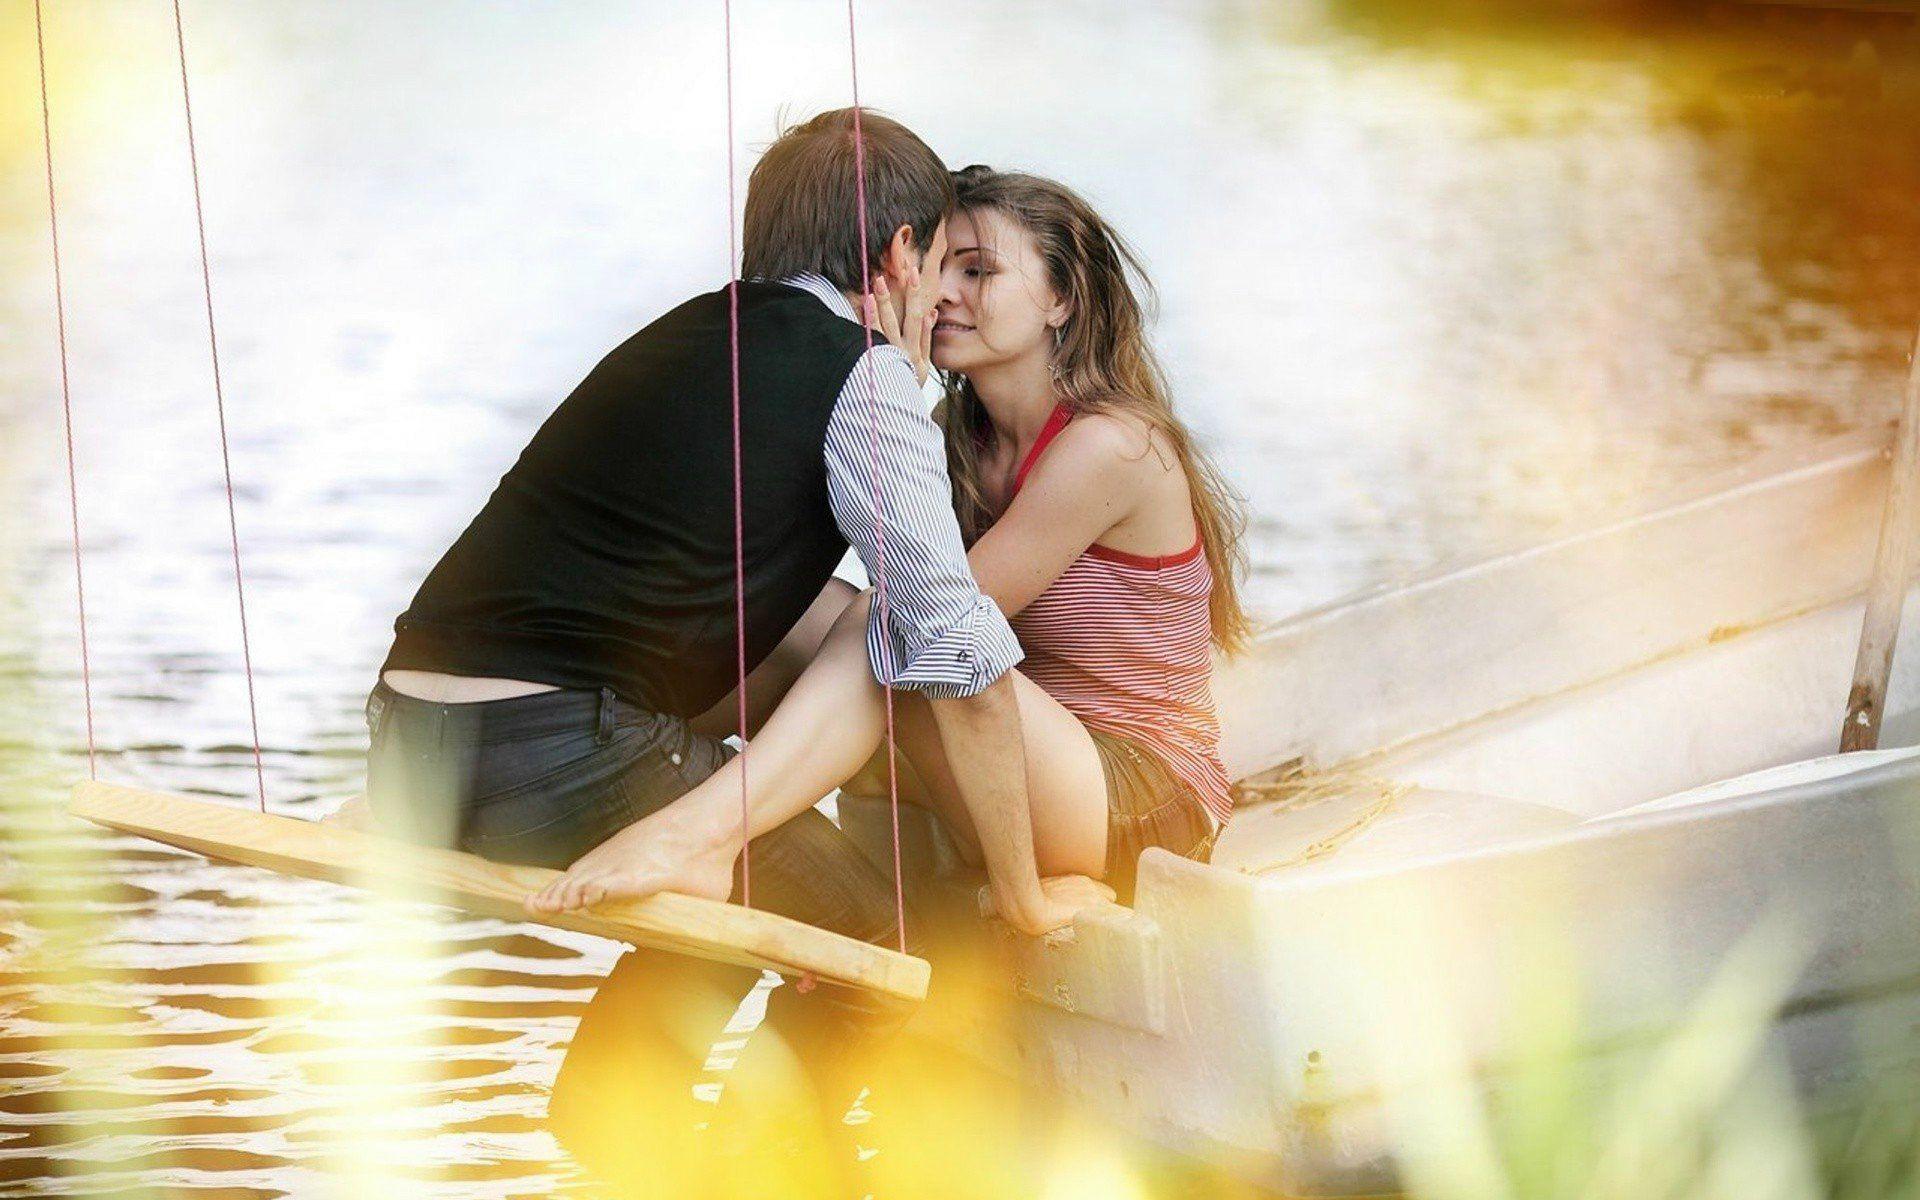 romantic-couple-kiss-hd-wallpapers-couple